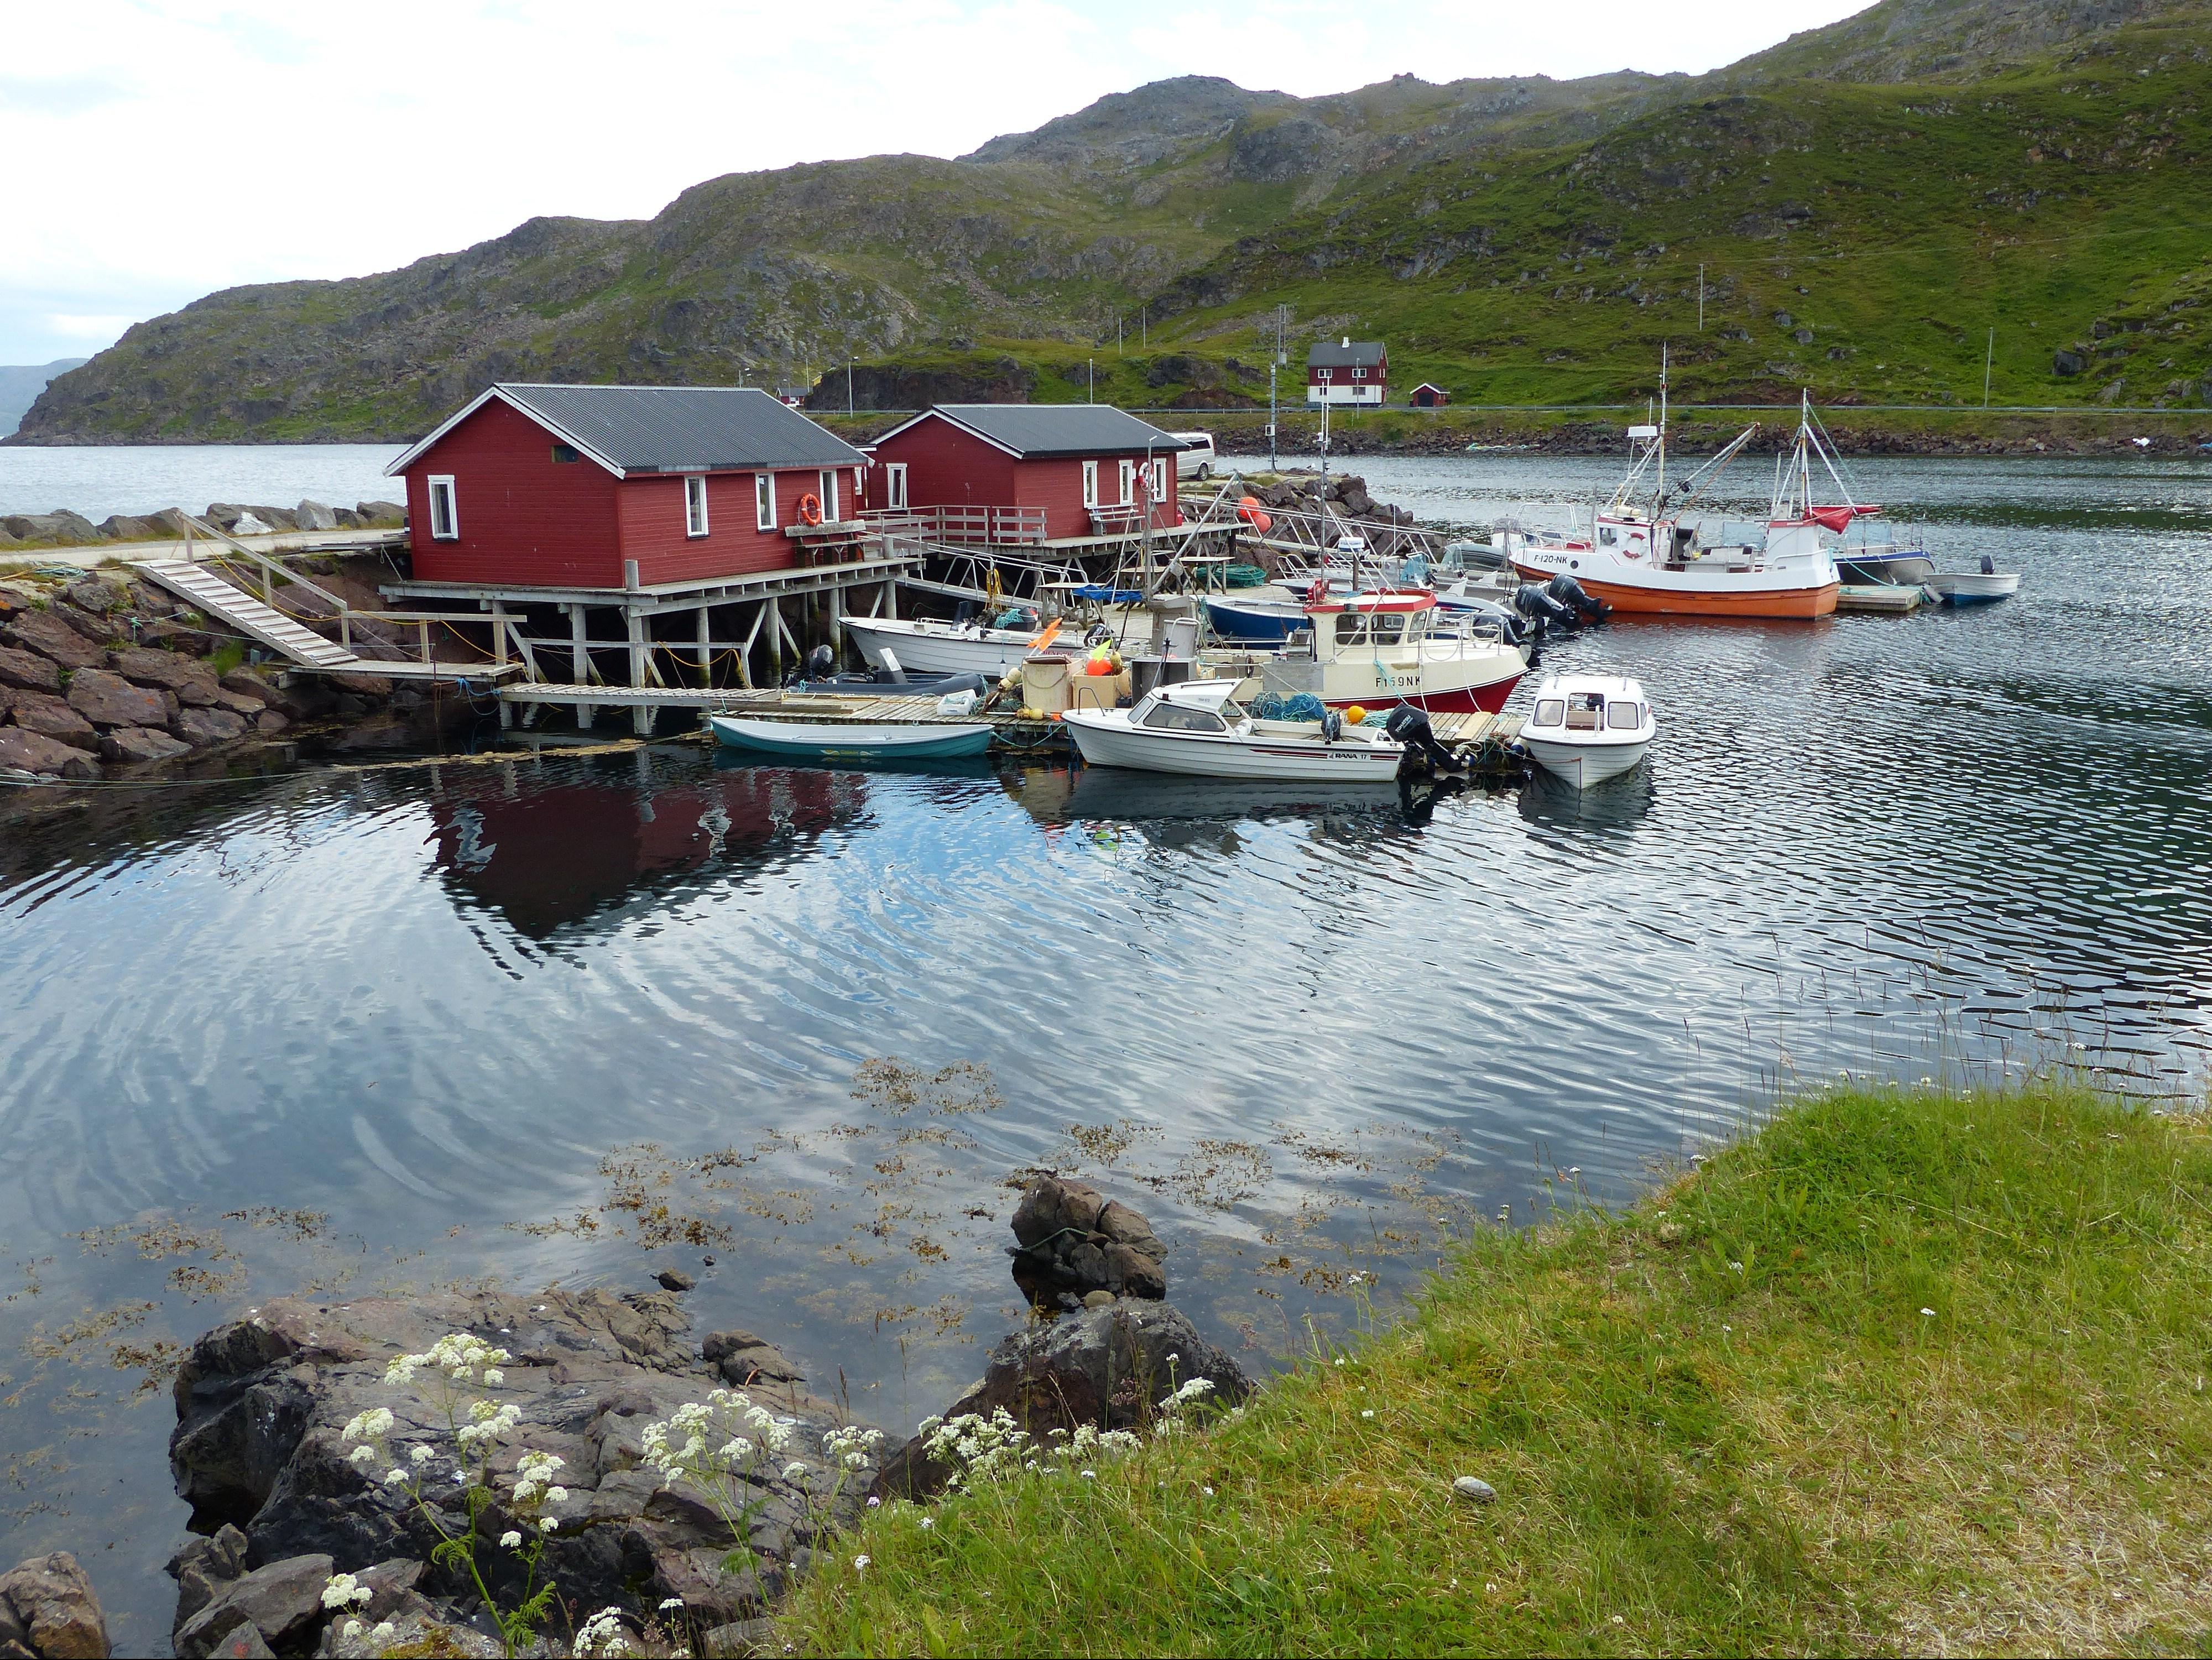 The fishing village Kamøyvær near the North Cape